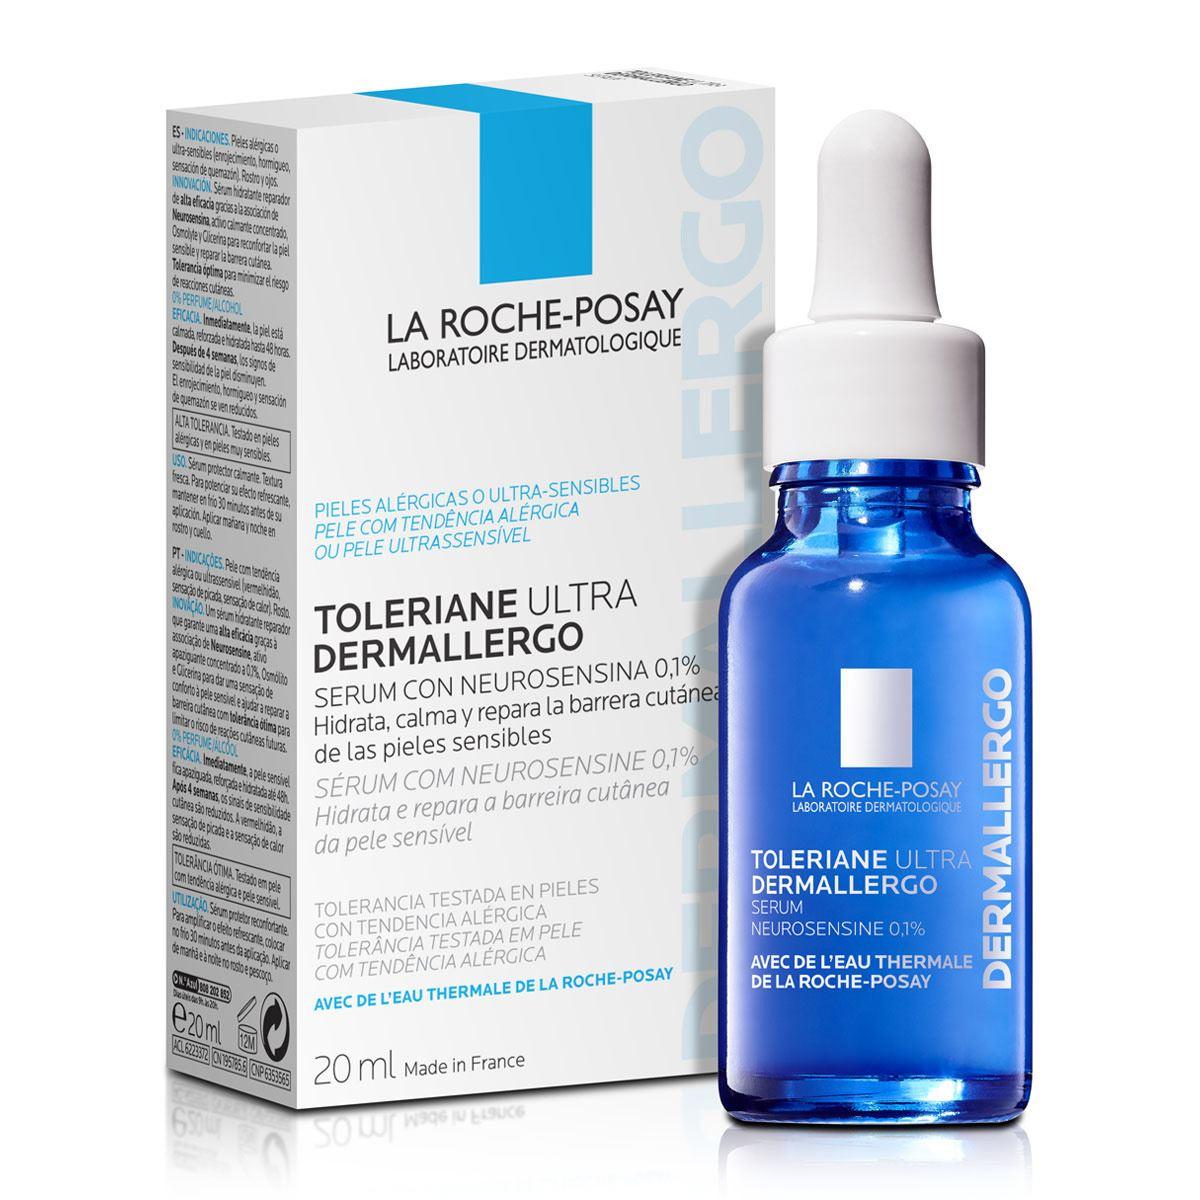 La Roche Posay Toleriane Ultra Dermallergo Siero Neurosensine 0,1% 20 ml